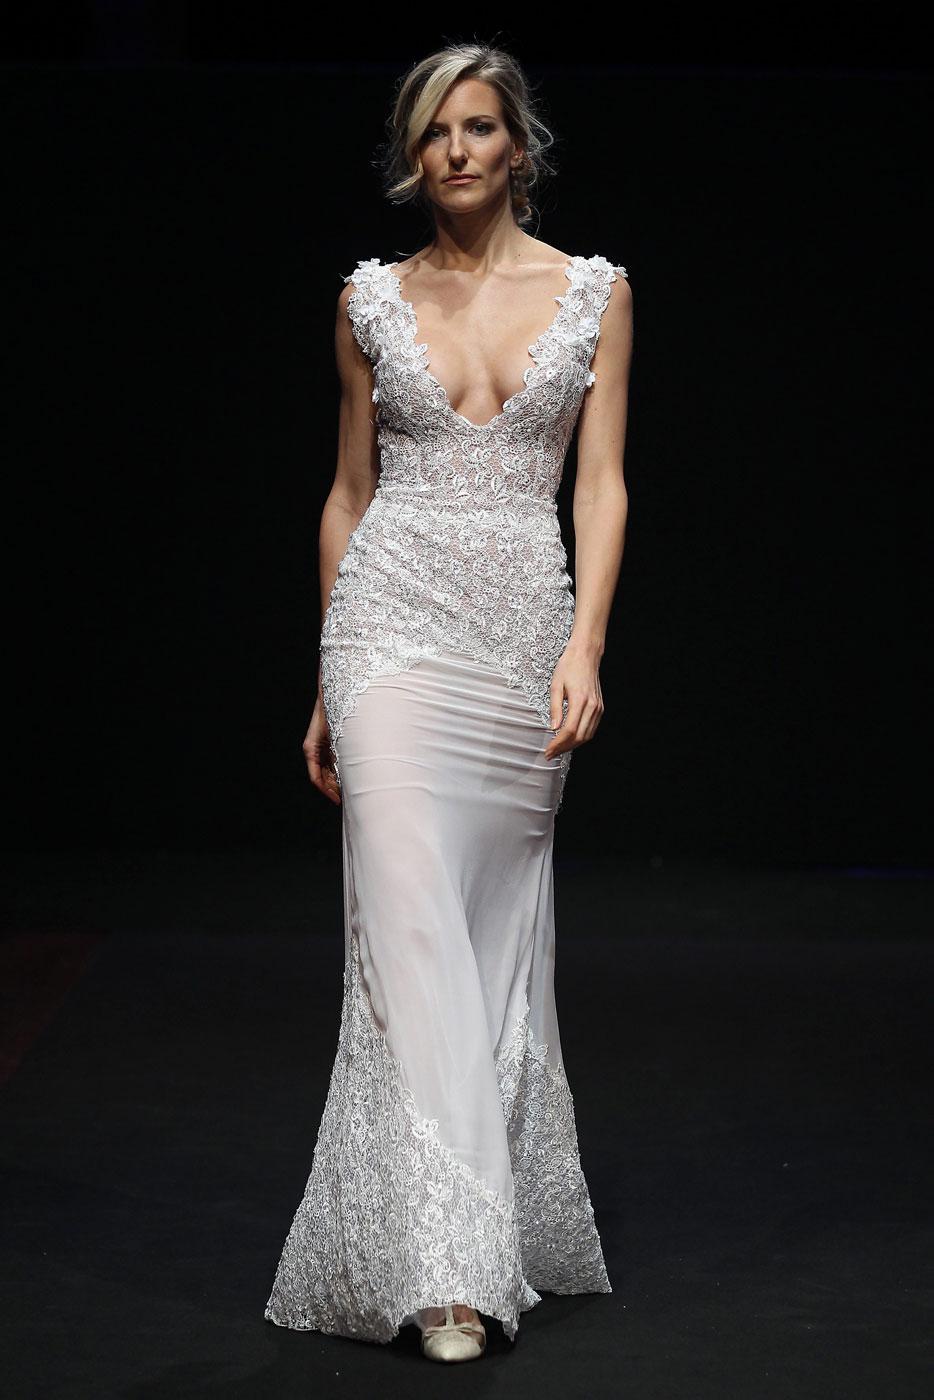 Abed-Mahfouz-fashion-runway-show-haute-couture-paris-spring-2015-the-impression-02